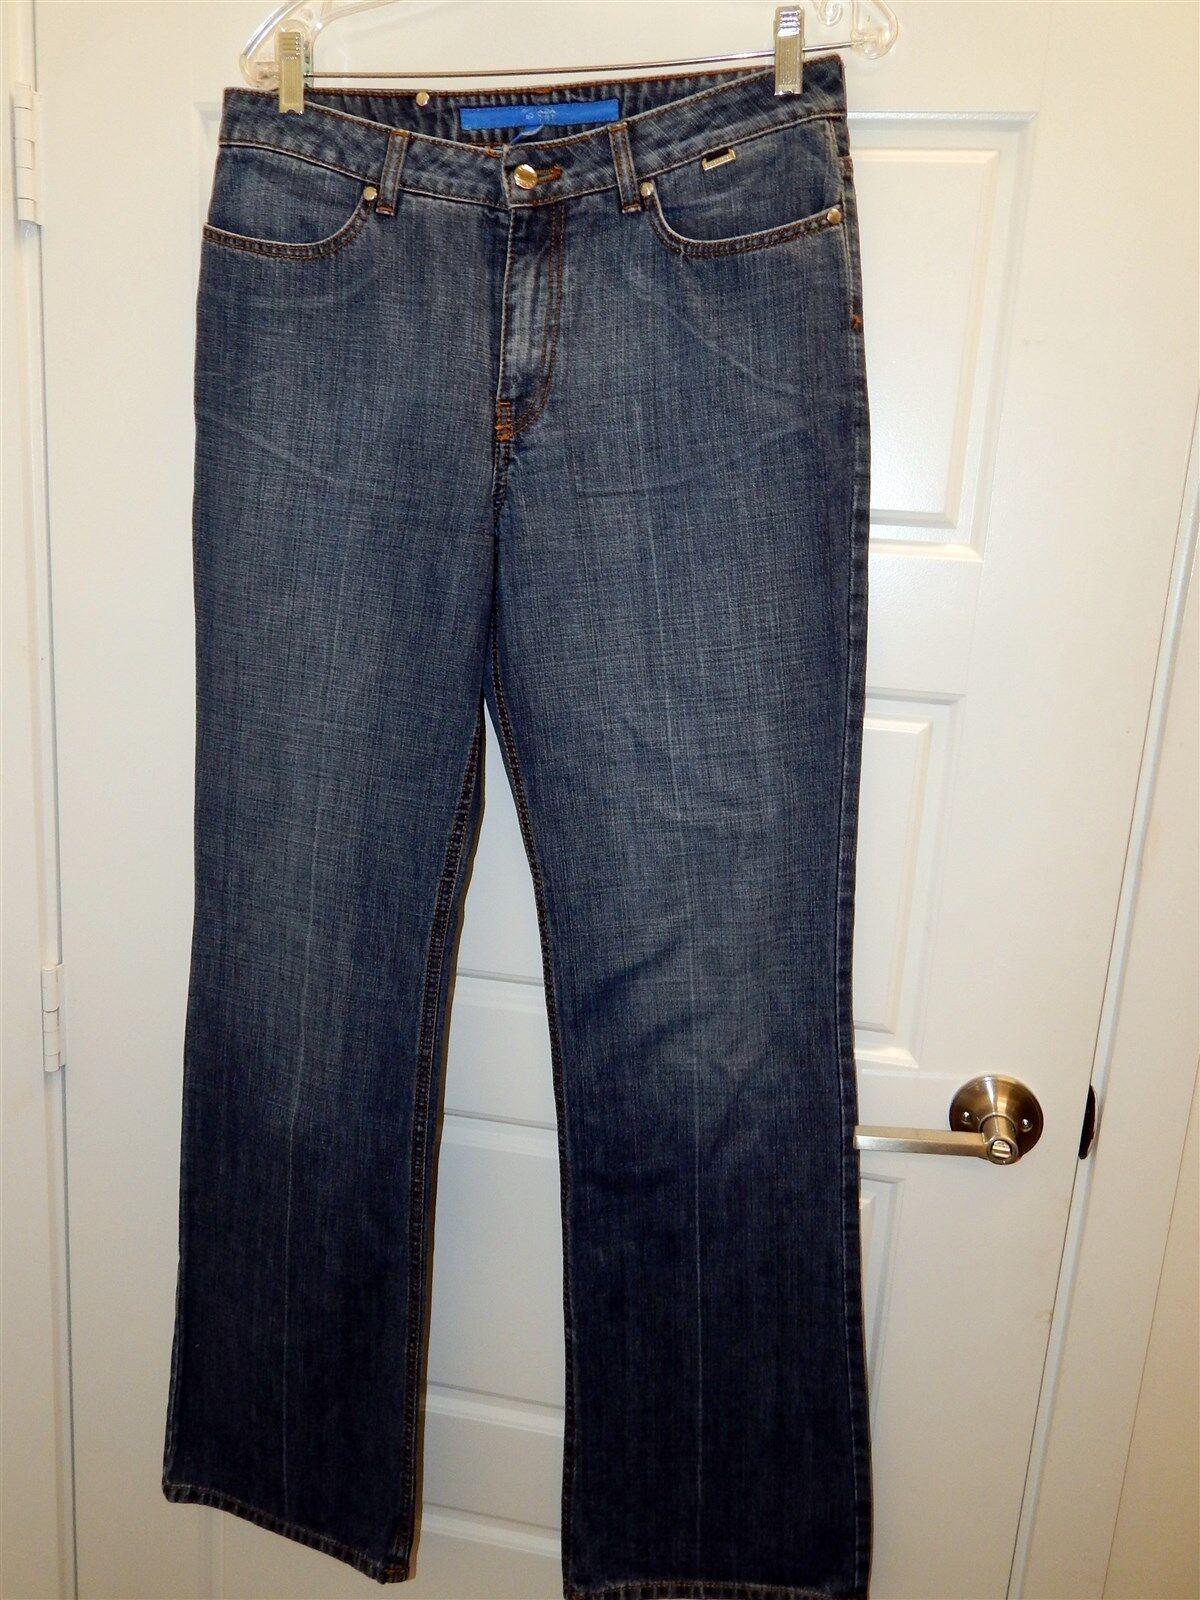 Escada Sport Navy bluee Wash Jeans sz 40